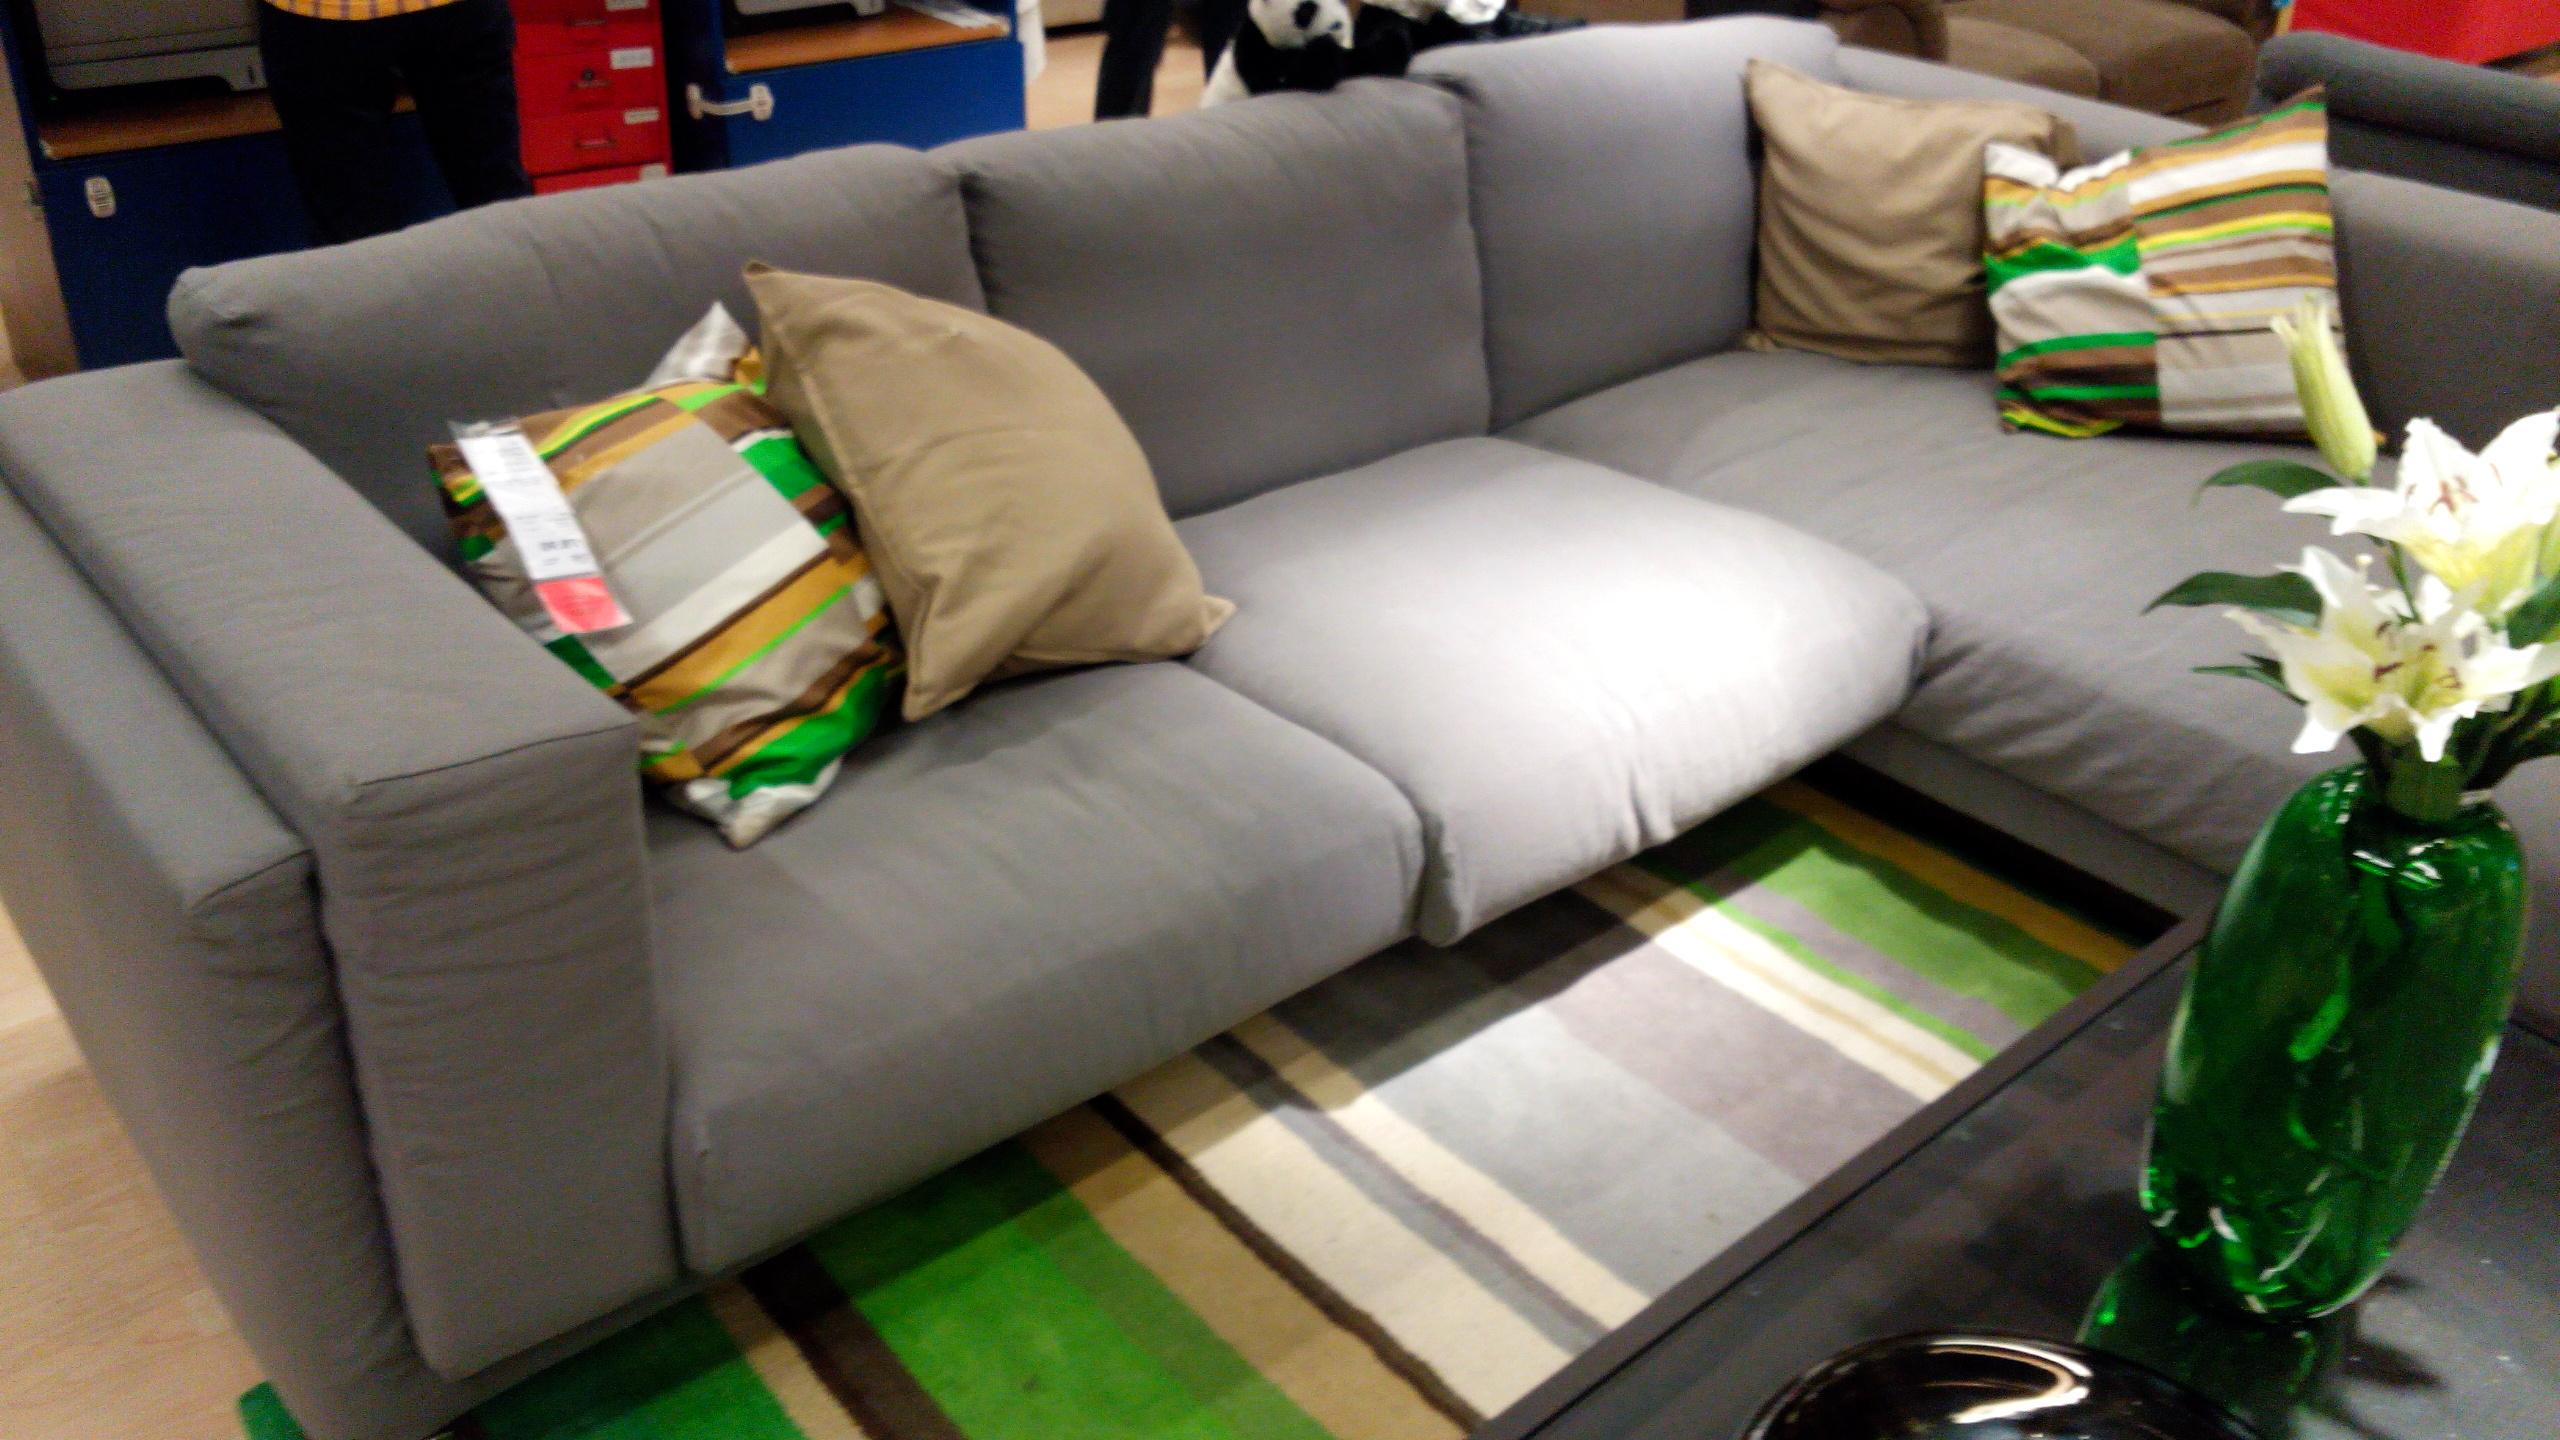 Sofa Nockeby Xtd6 Ikea Nockeby sofa Review New Ikea Couch Series Mid 2014 fort